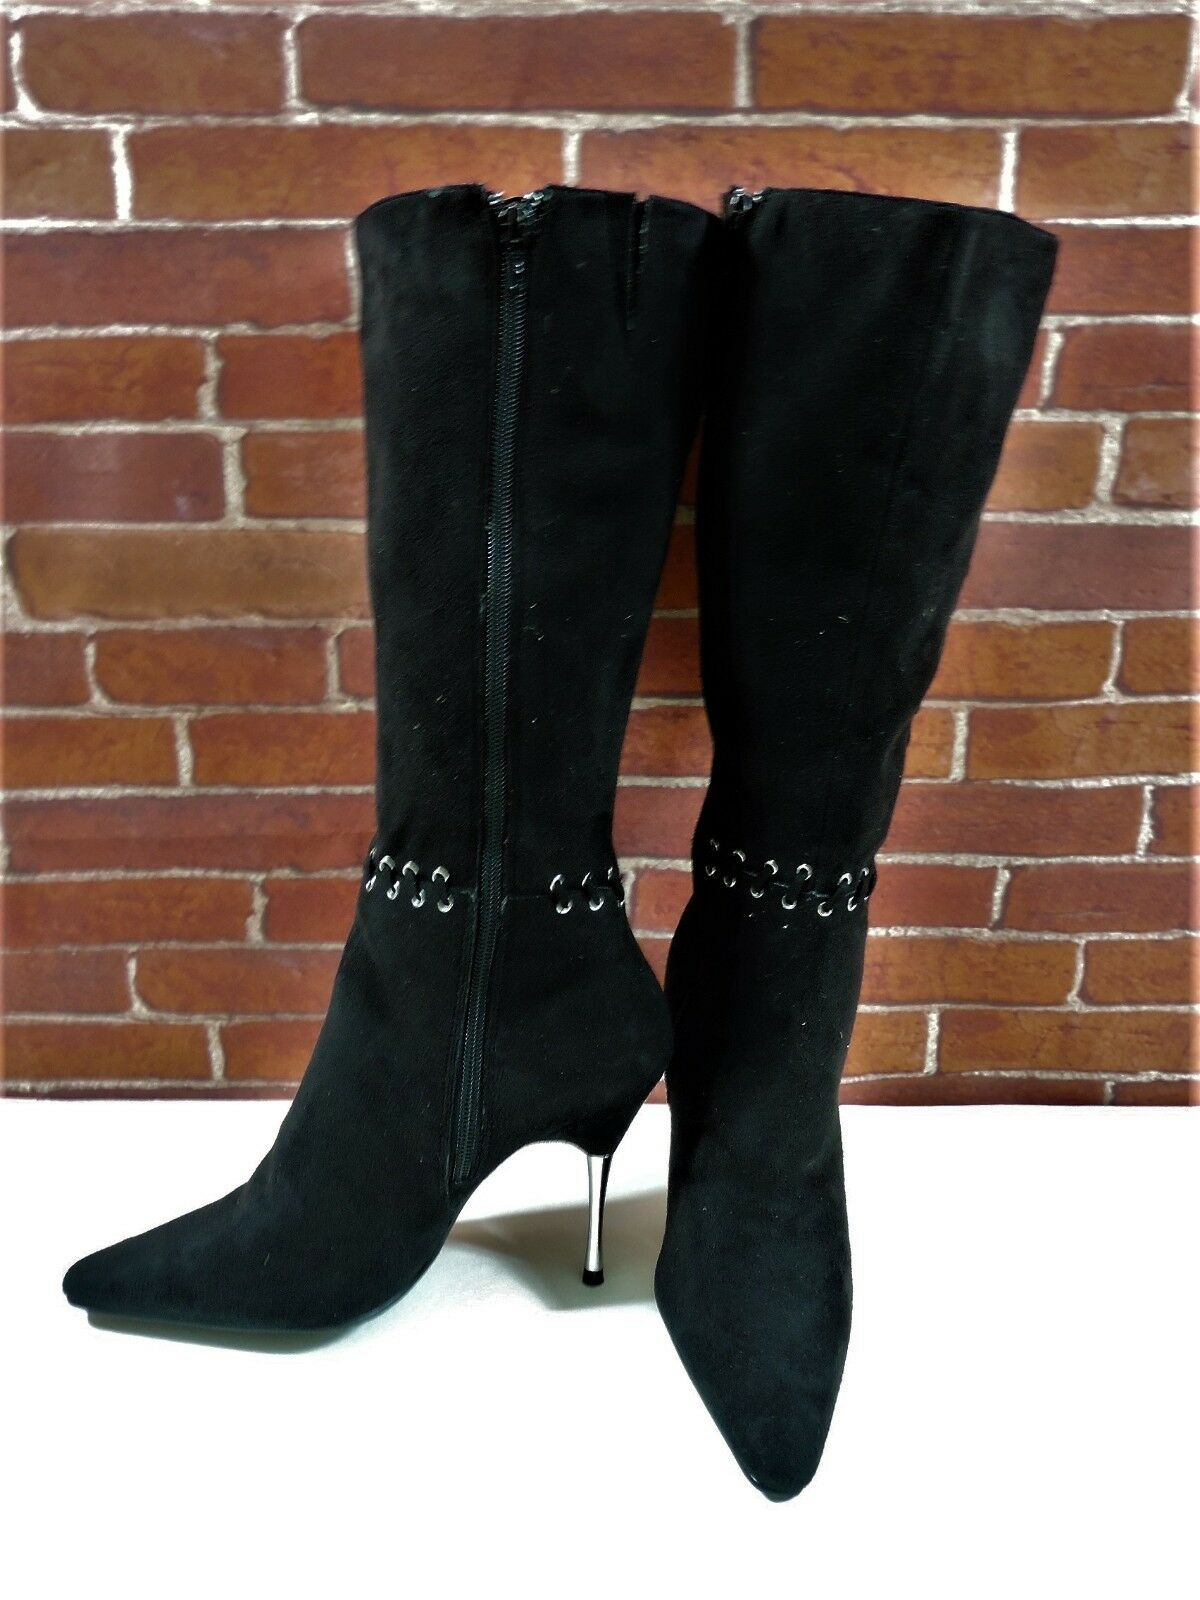 Womens Ladies Black Knee High Boots - Size  UK 5  EU 38